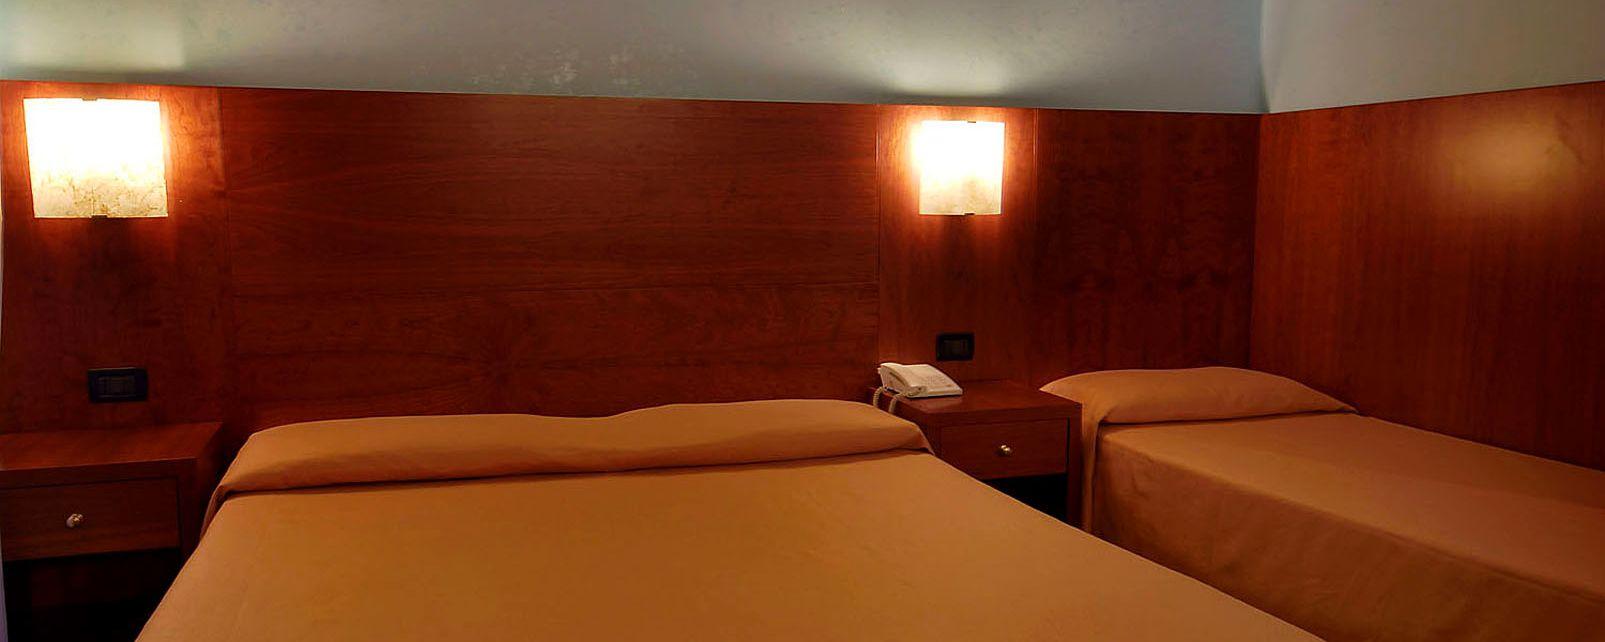 Hotel Osimar